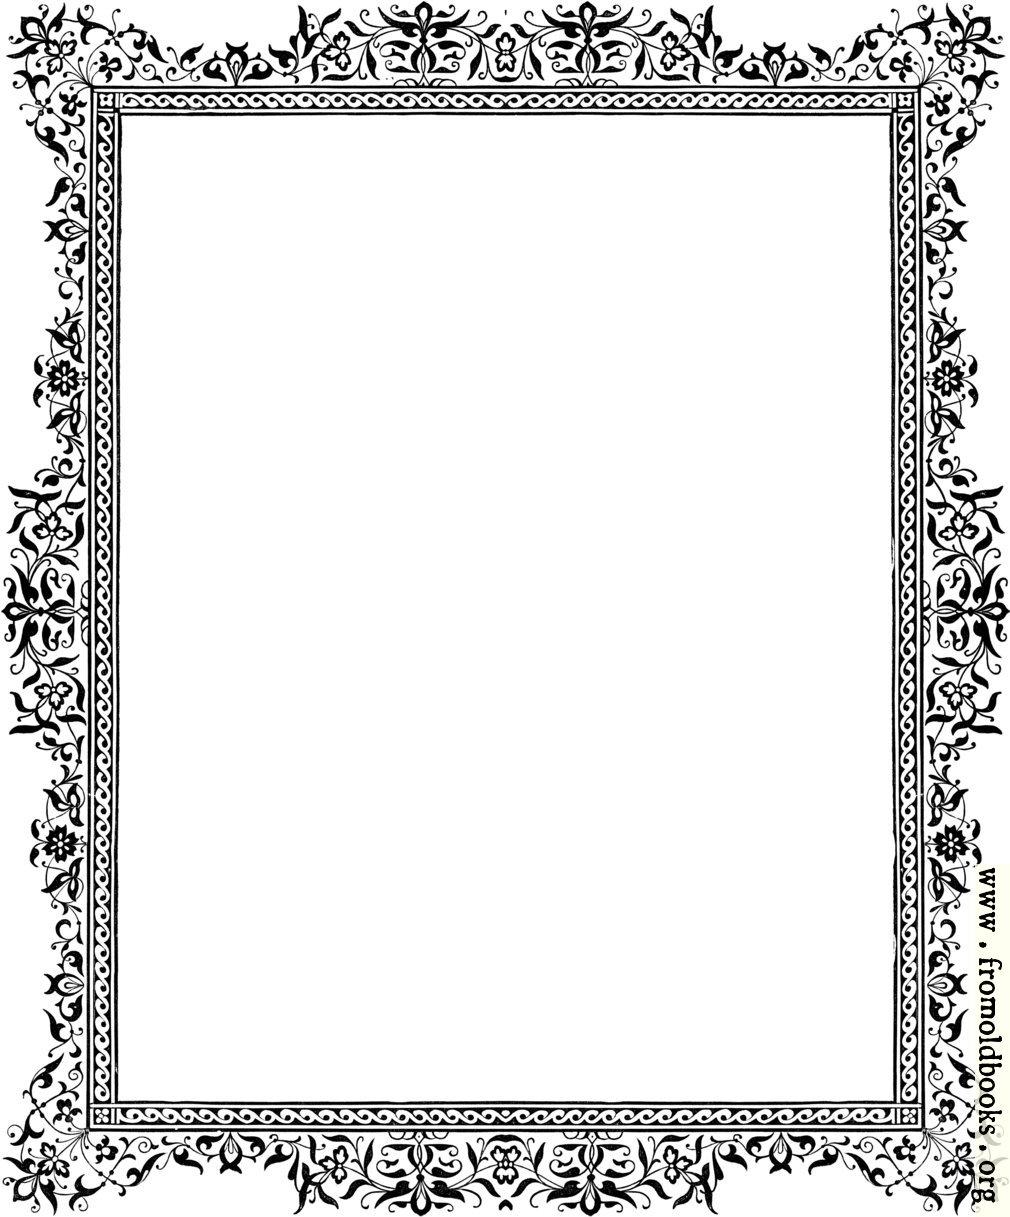 Decorative clipart Victorian border Black and White image 1010x1217 pixels